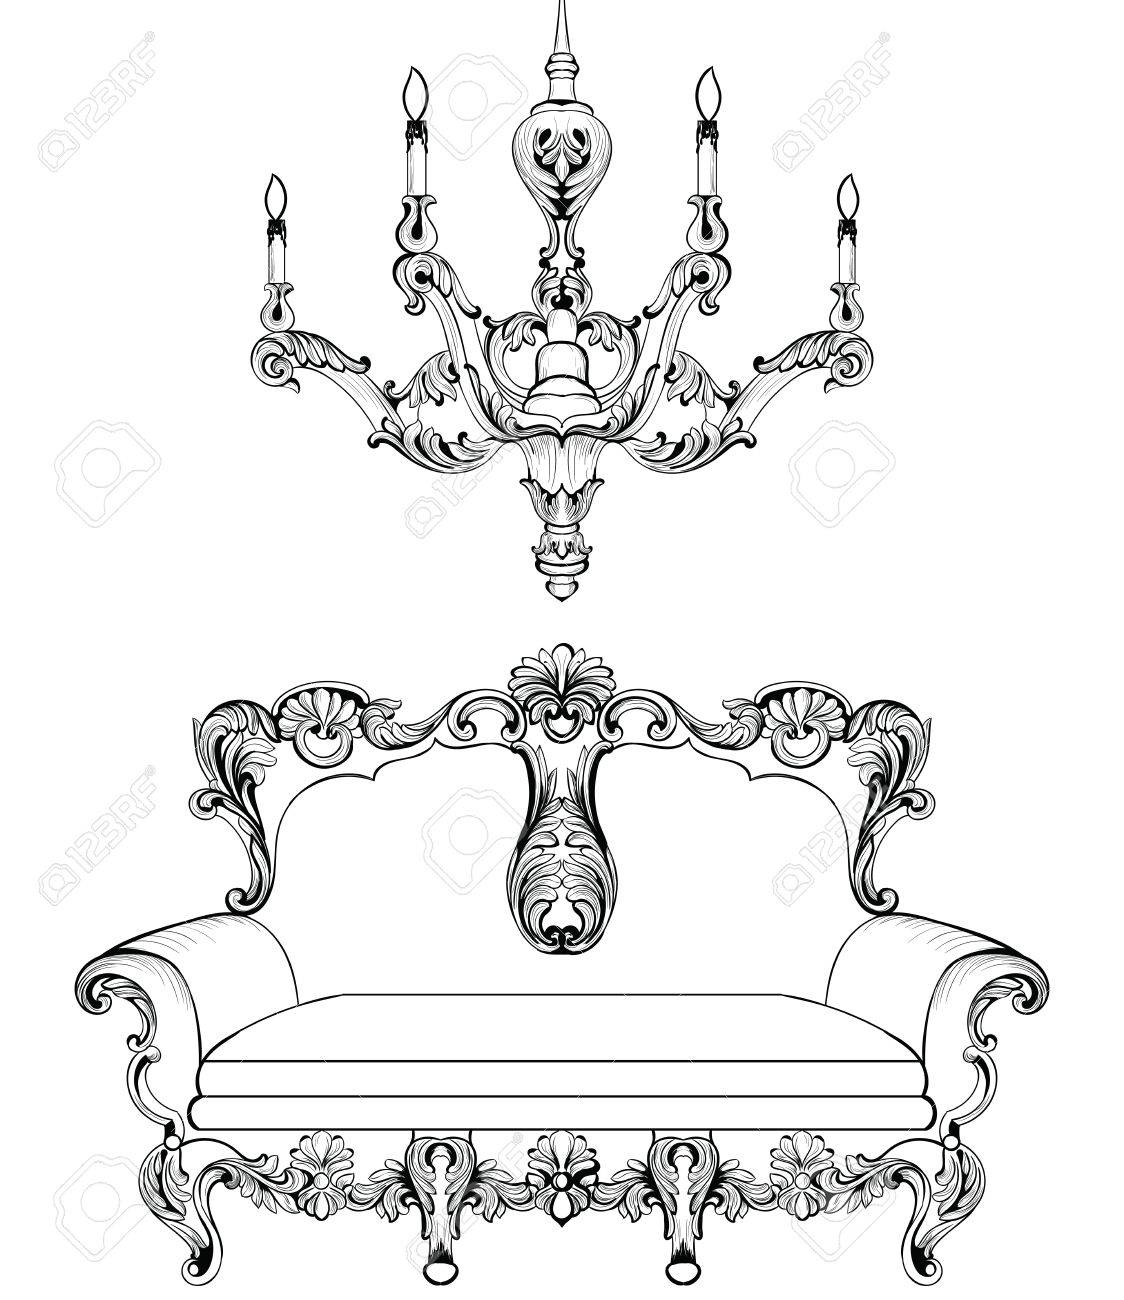 Full Size of Barock Sofa Exquisite Fabulous Imperial Und Kronleuchter Graviert Bullfrog Konfigurator Machalke Günstig Kaufen Xora Bunt 3er Grau Leinen Mit Abnehmbaren Sofa Barock Sofa